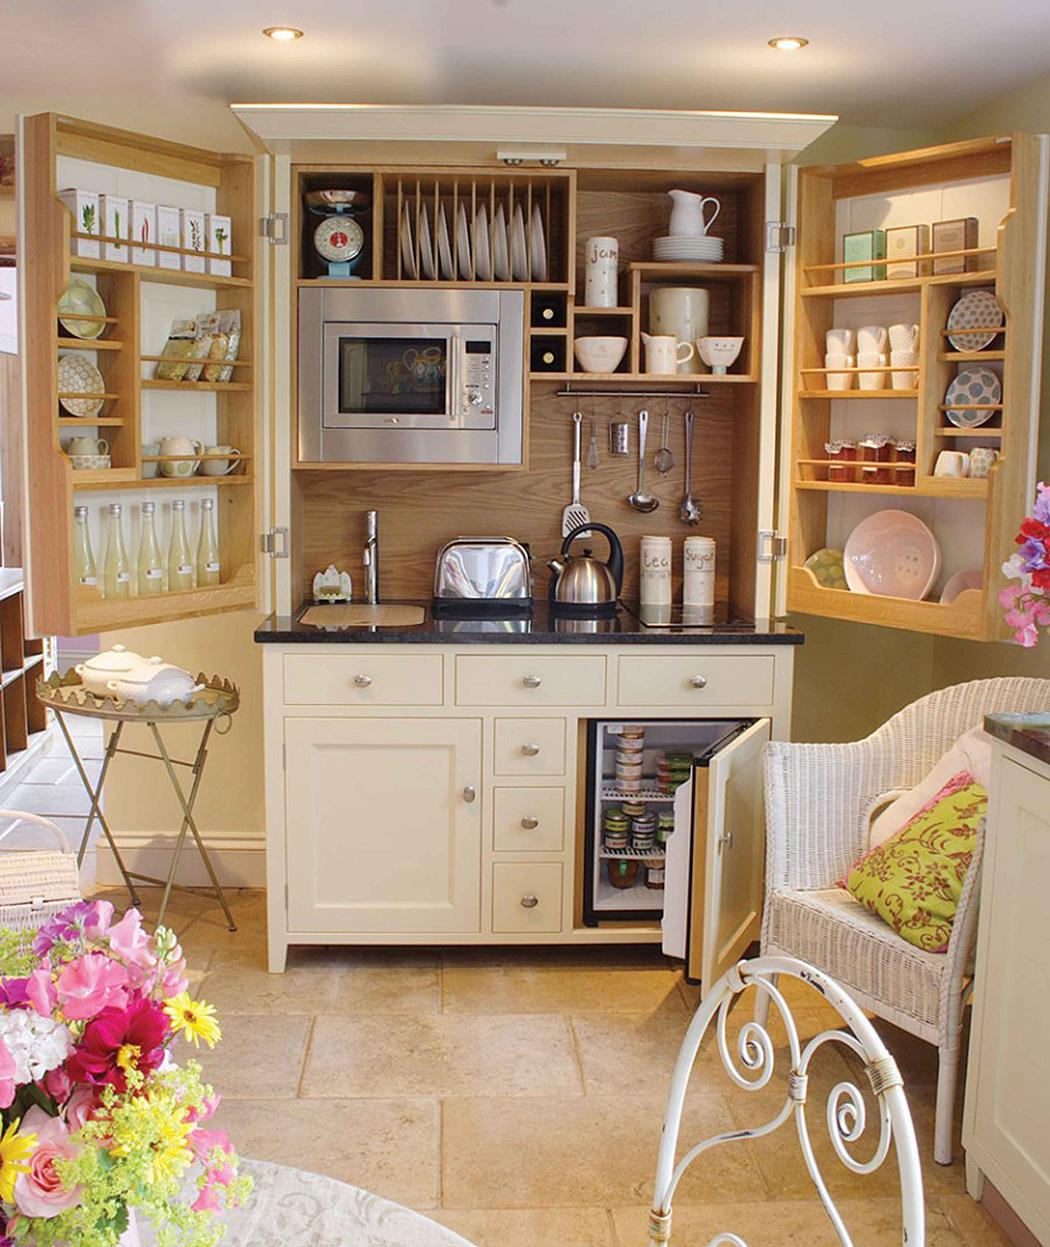 An Entire Kitchen Hidden In A Beautiful Furniture Piece